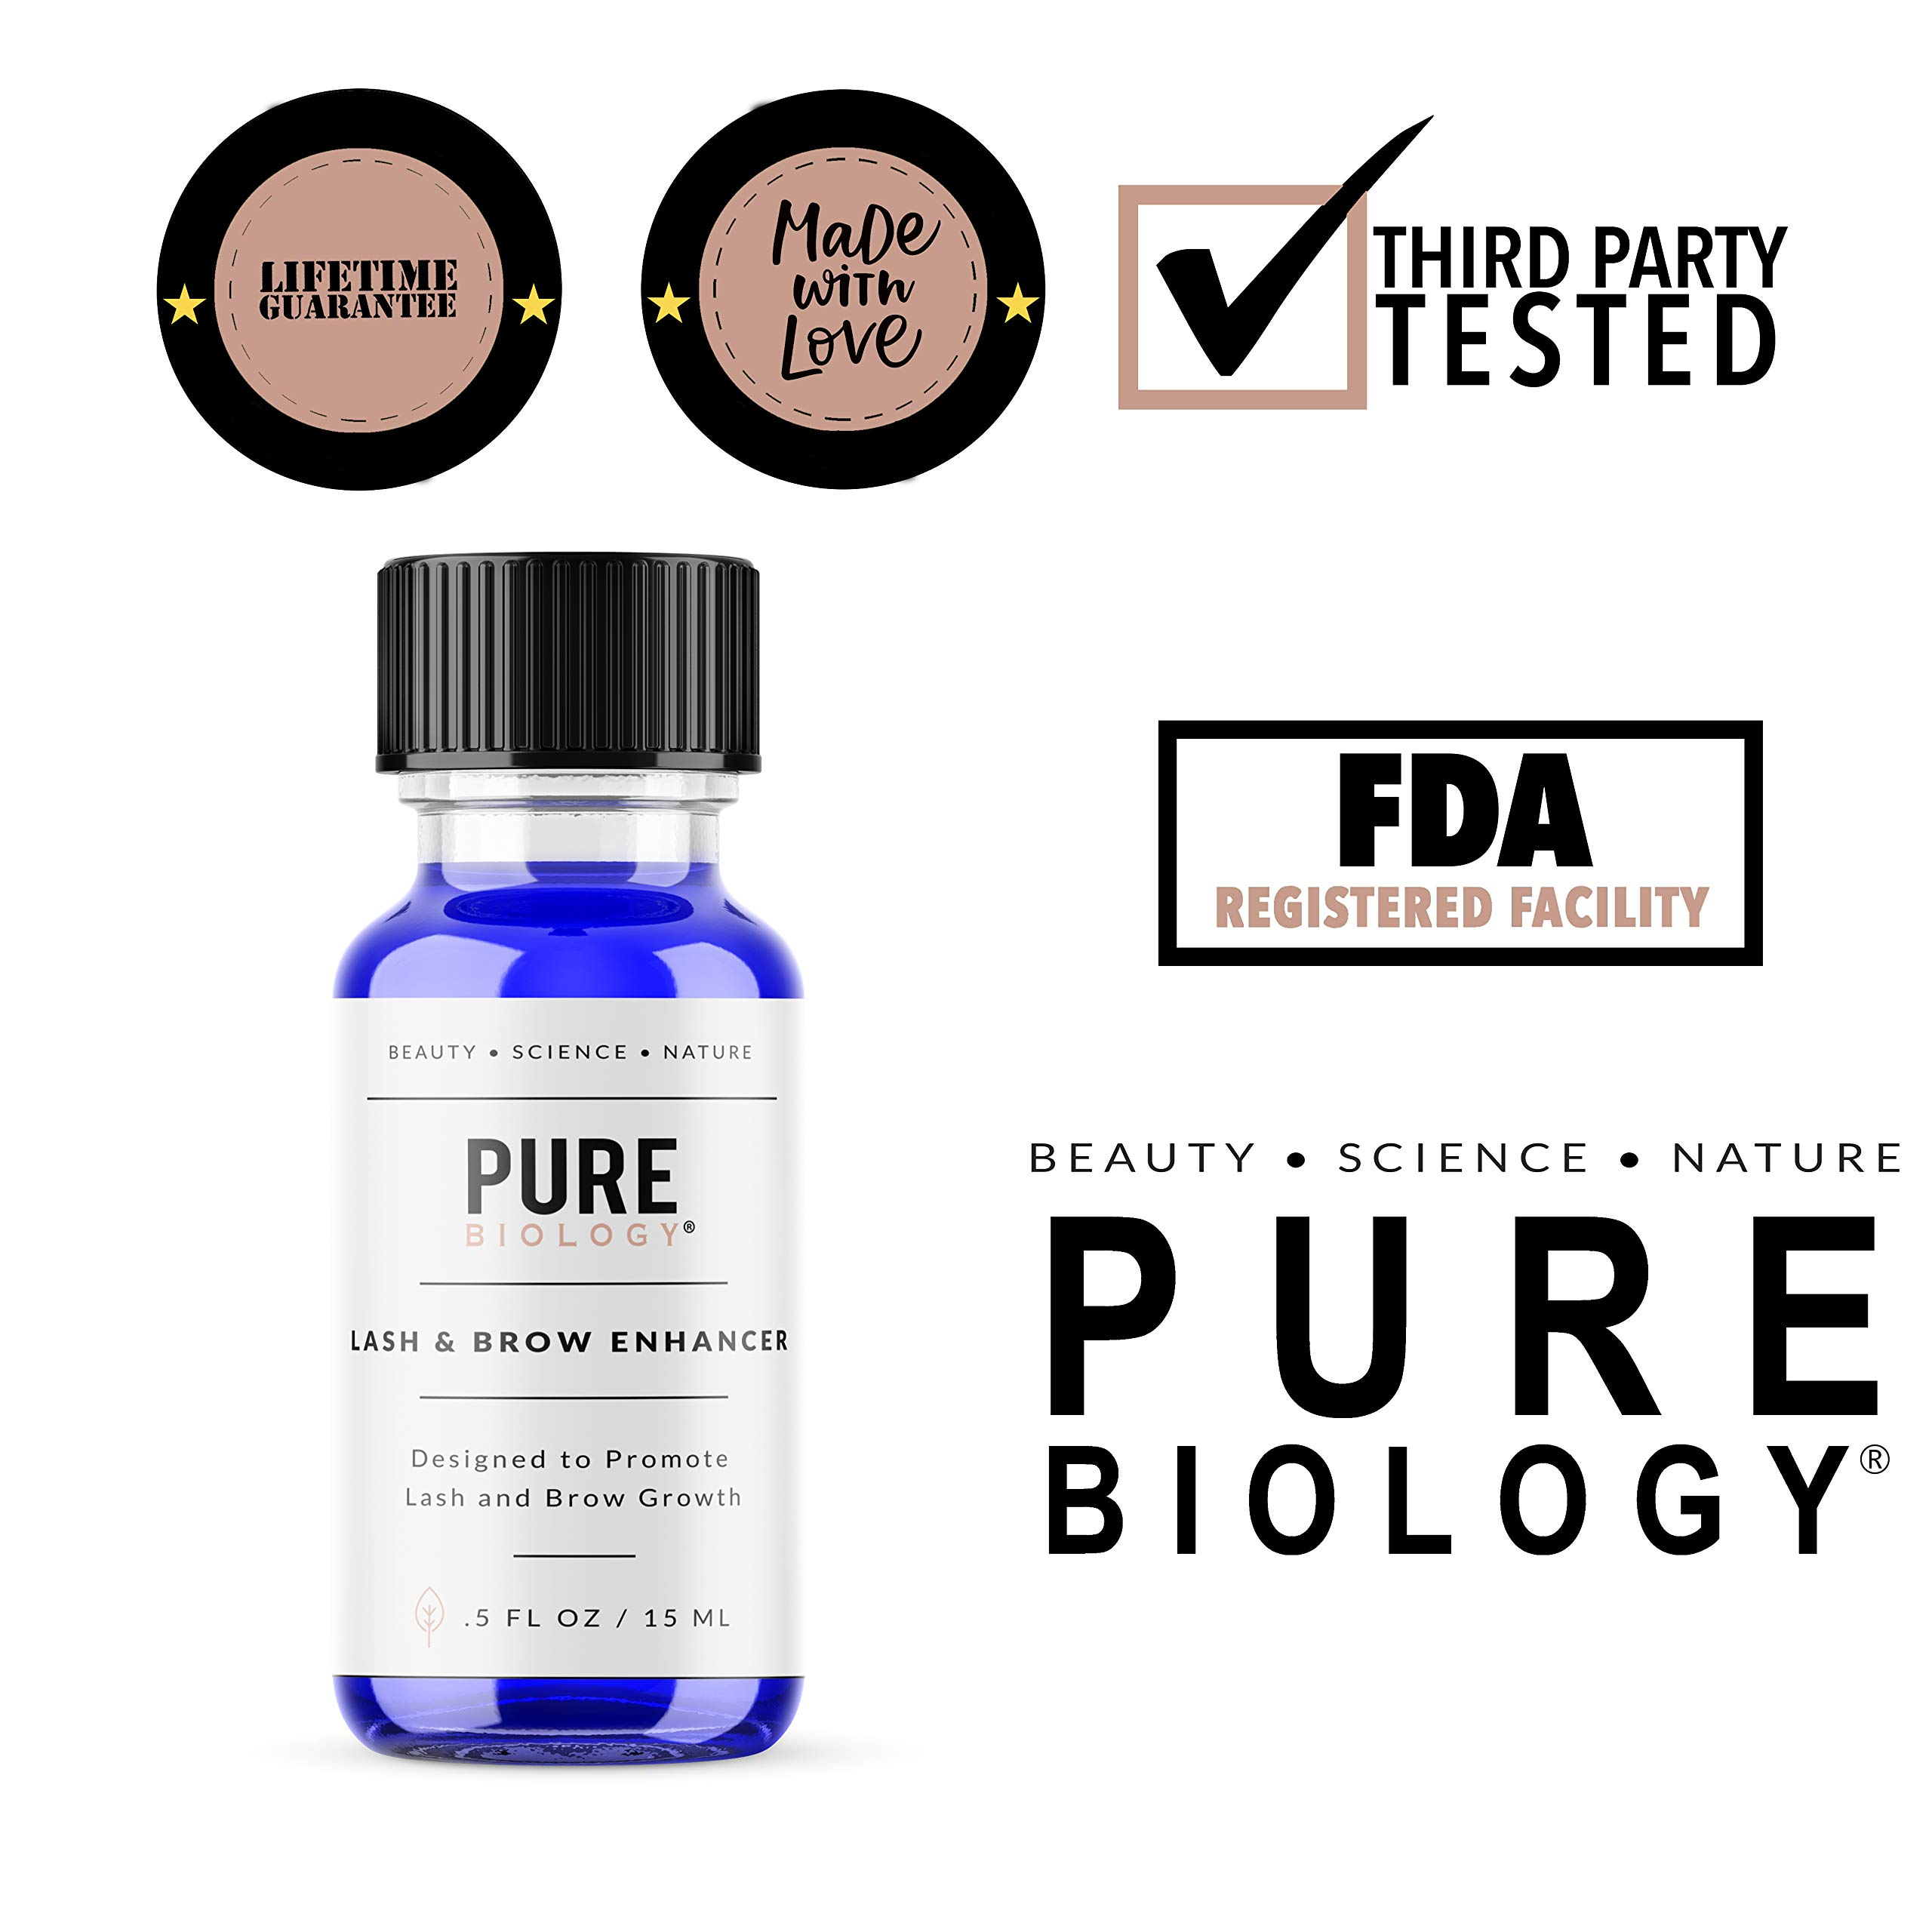 Premium Eyelash Growth Serum & Eyebrow Enhancer - Castor Oil, Biotin, Green Tea Extract, Natural DHT Blockers & Breakthrough Hair Growth Stimulating Complex for Men & Women by Pure Biology (Image #6)